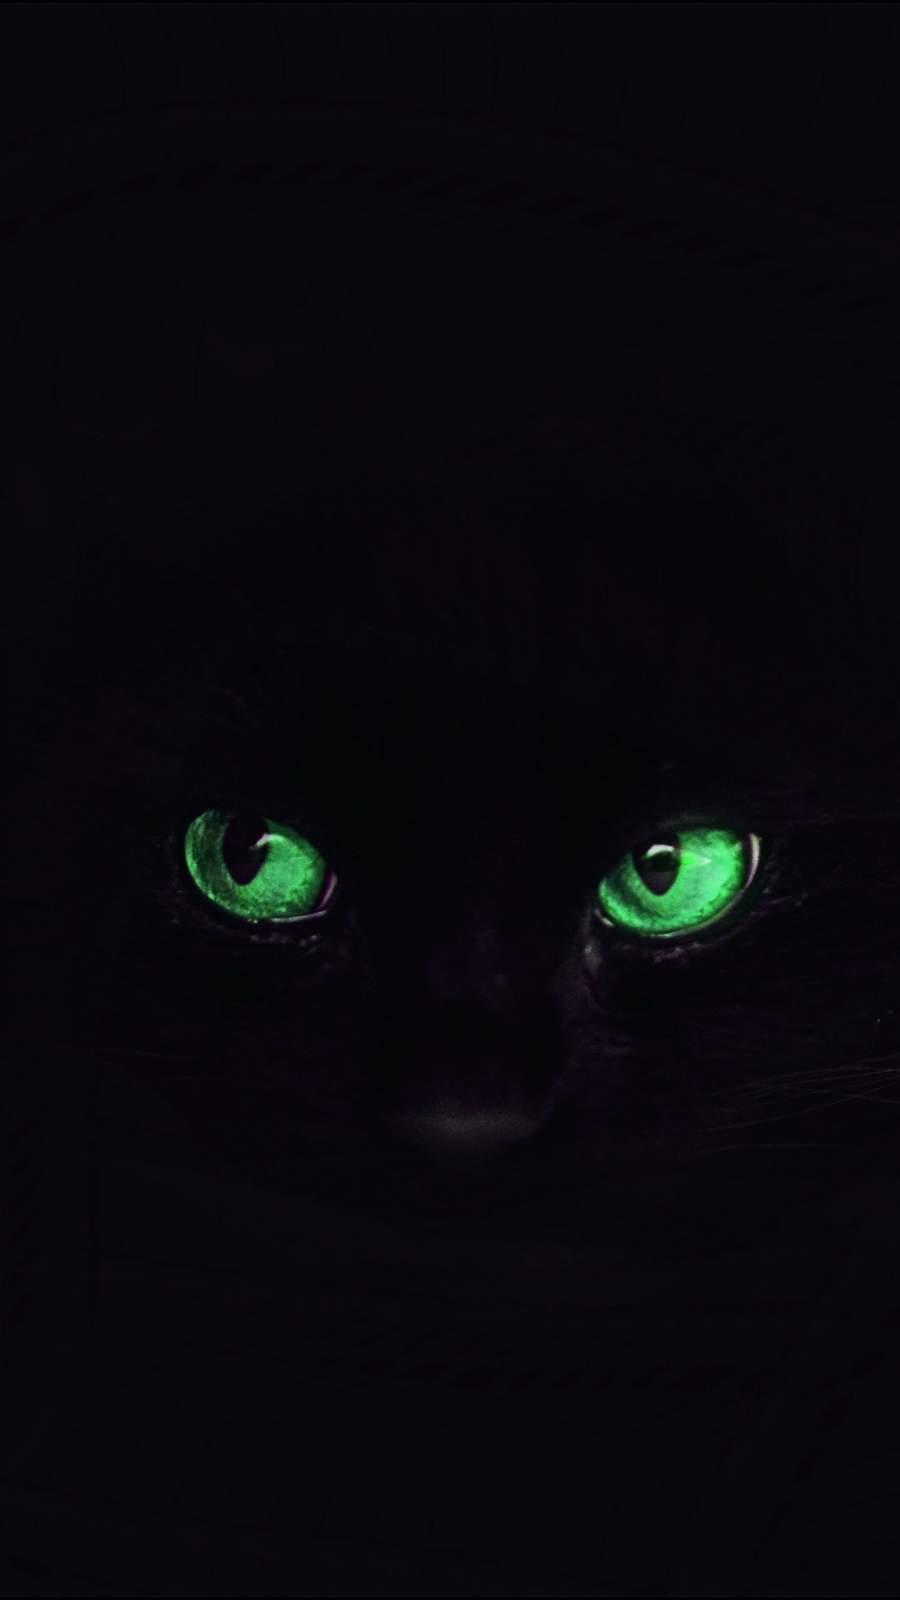 Black Cat Eyes iPhone Wallpaper